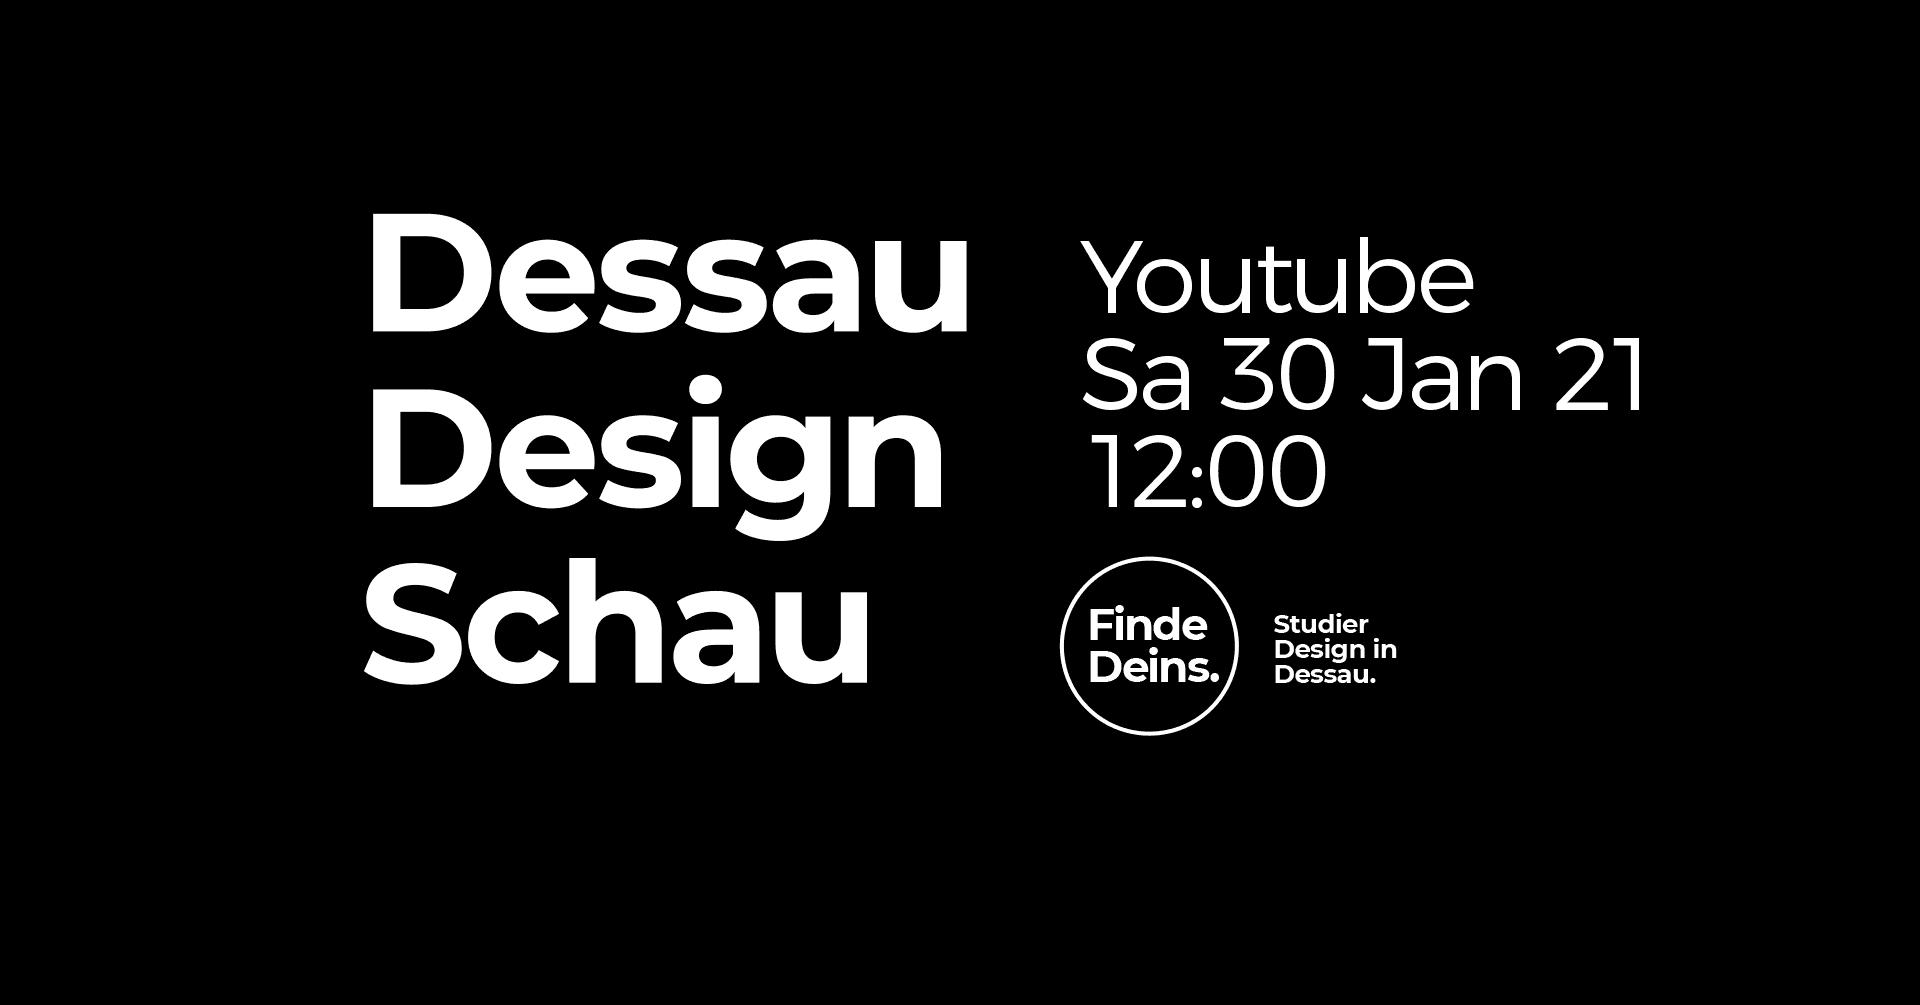 Dessau Design Schau 2021